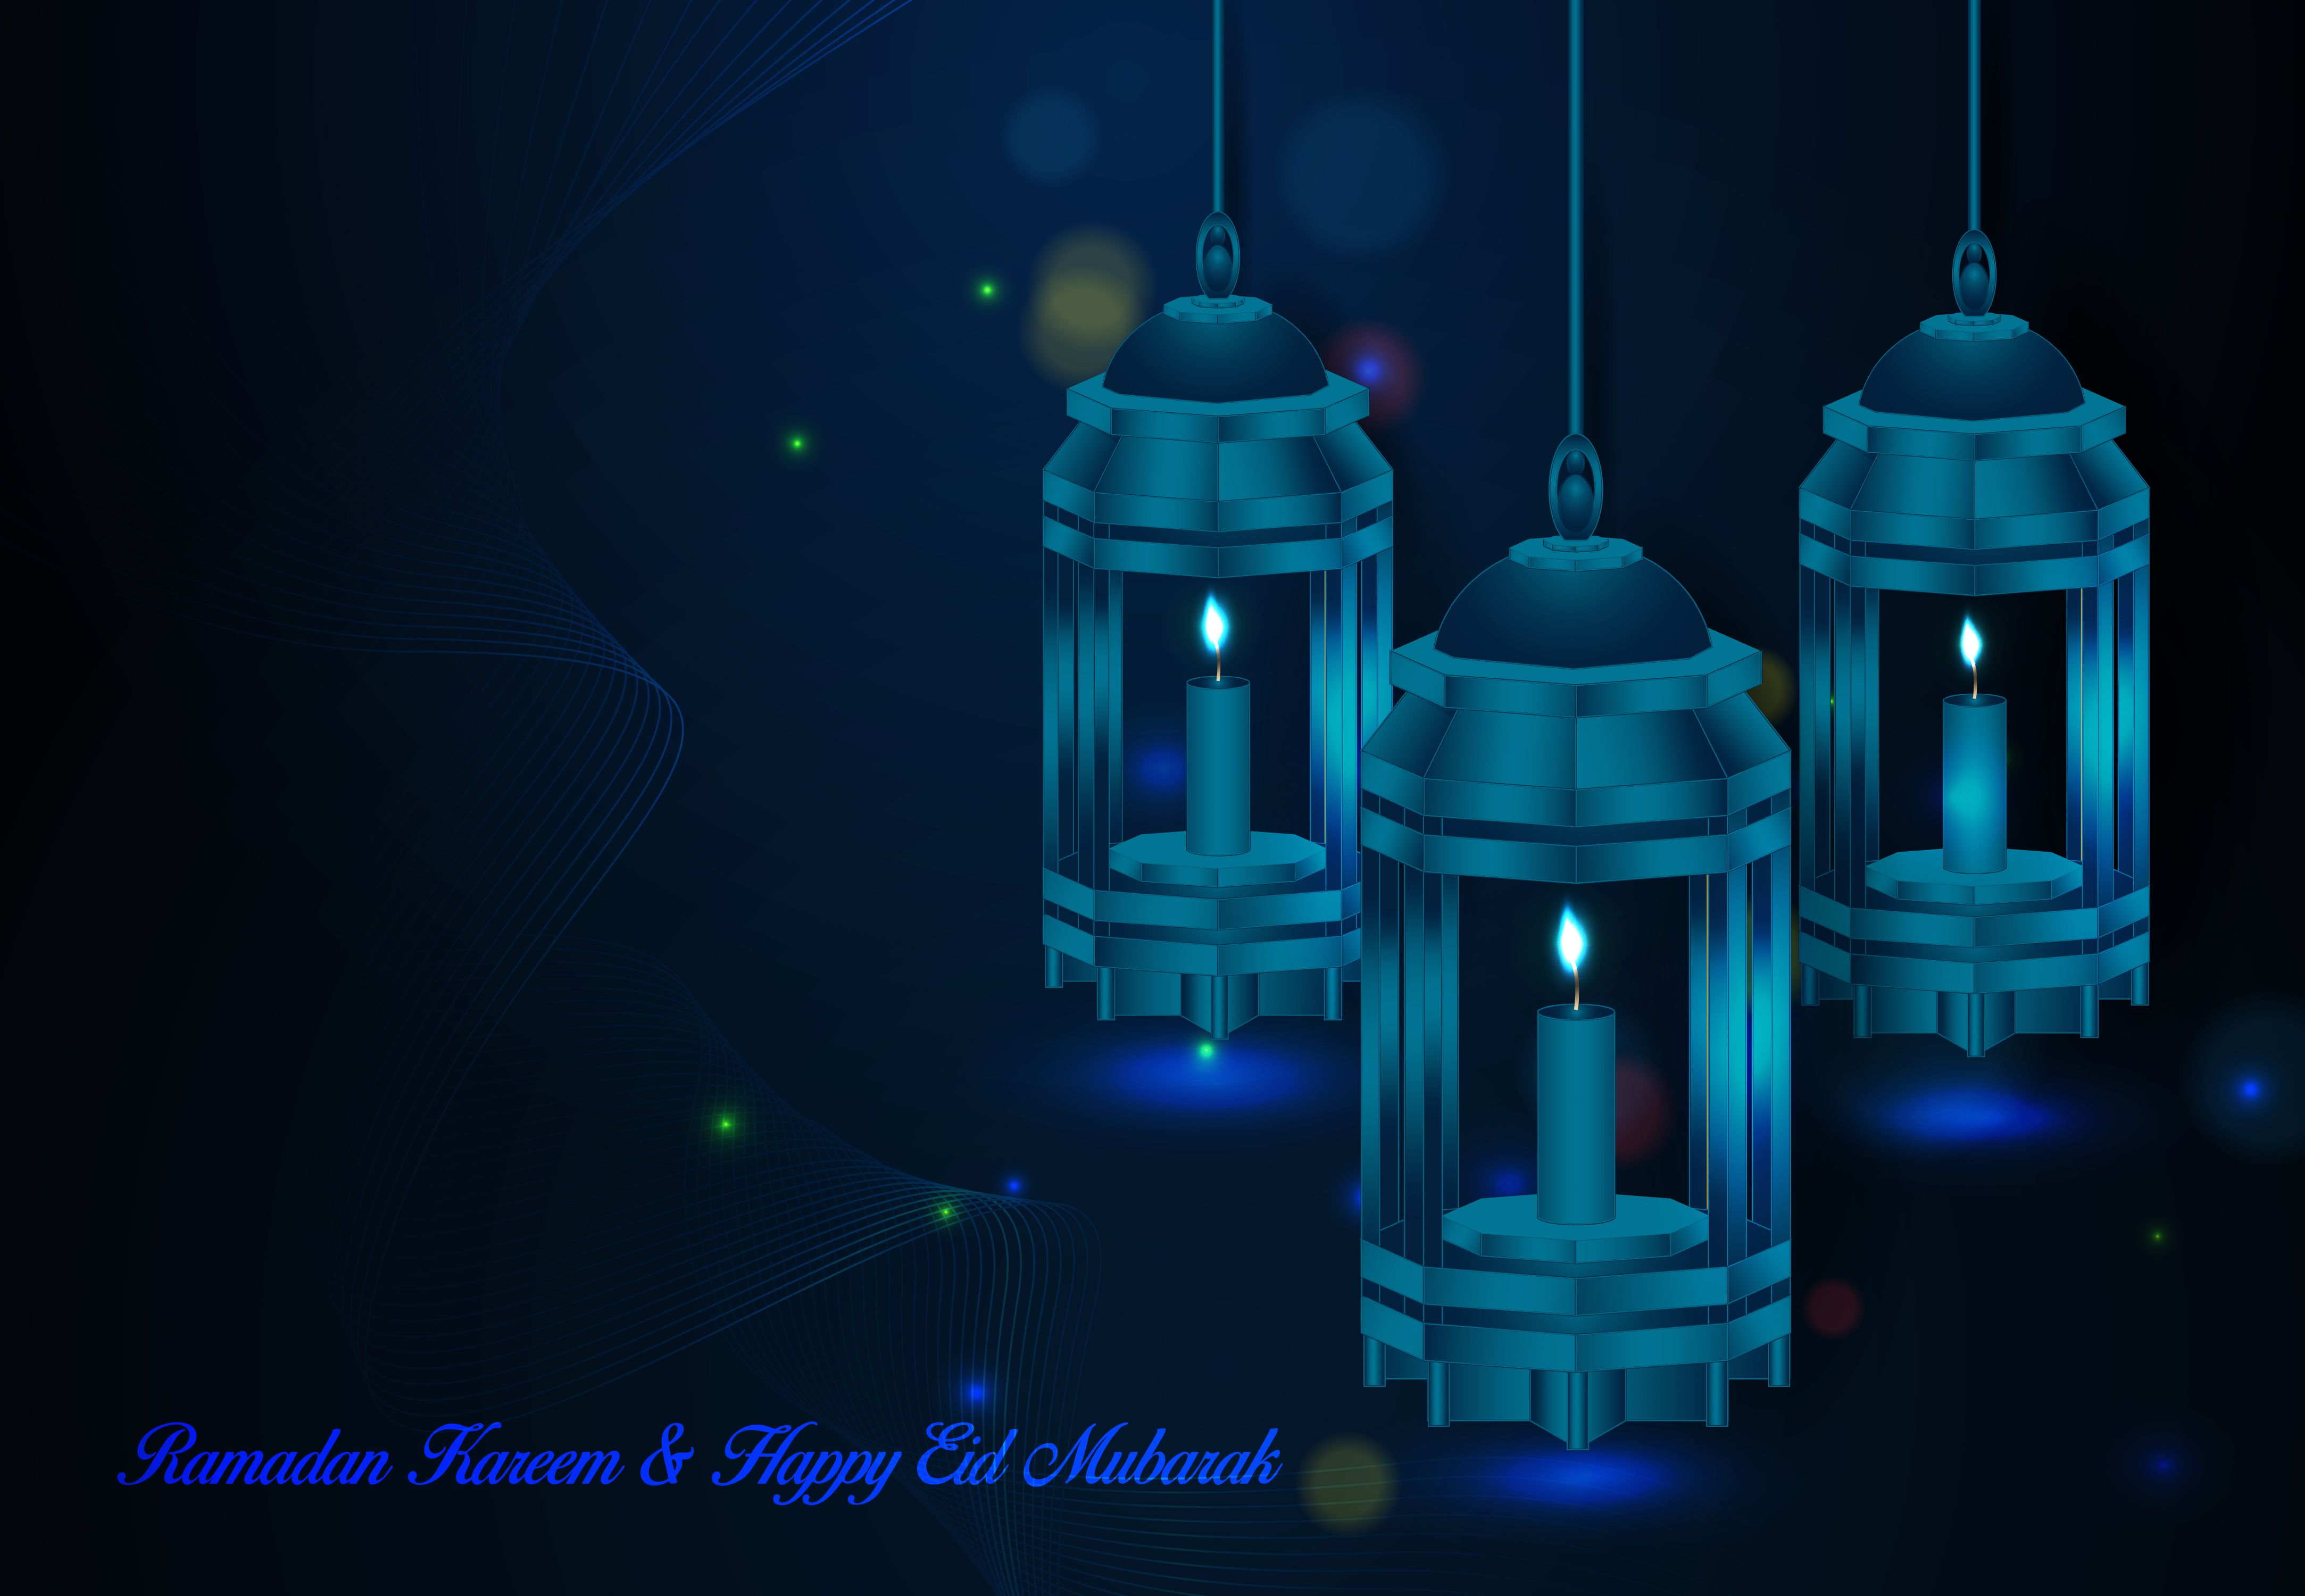 Ramadan And Happy Eid Mubarak Background Graphic By Sugarv Creative Creative Fabrica Happy Eid Mubarak Happy Eid Eid Mubarak Background